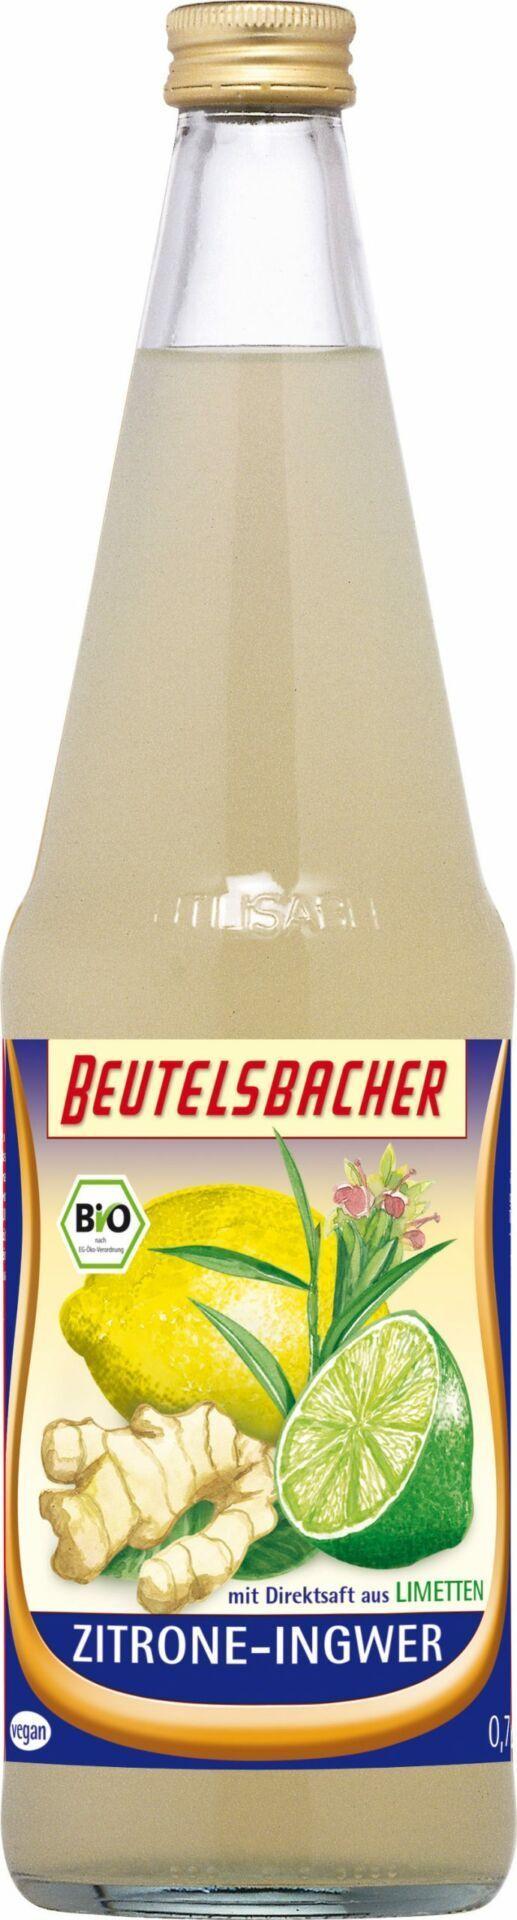 BEUTELSBACHER Bio Zitrone-Ingwer 6x0,7l